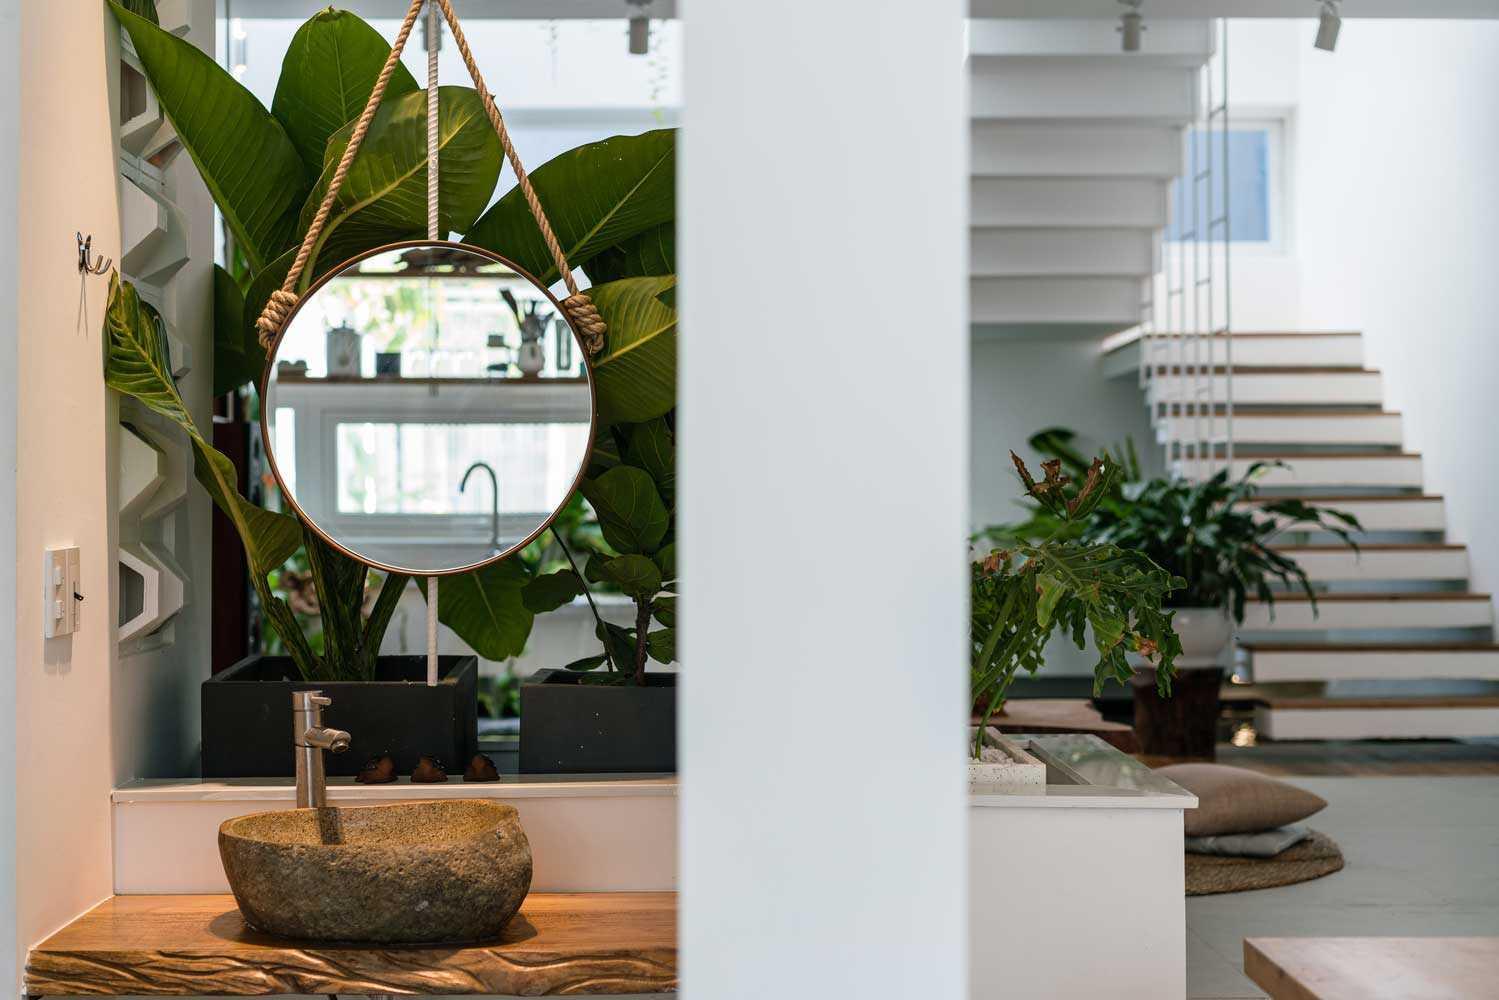 Elemen alam seolah membawa suasana outdoor di dalam rumah, karya Q Concept // archdaily.com